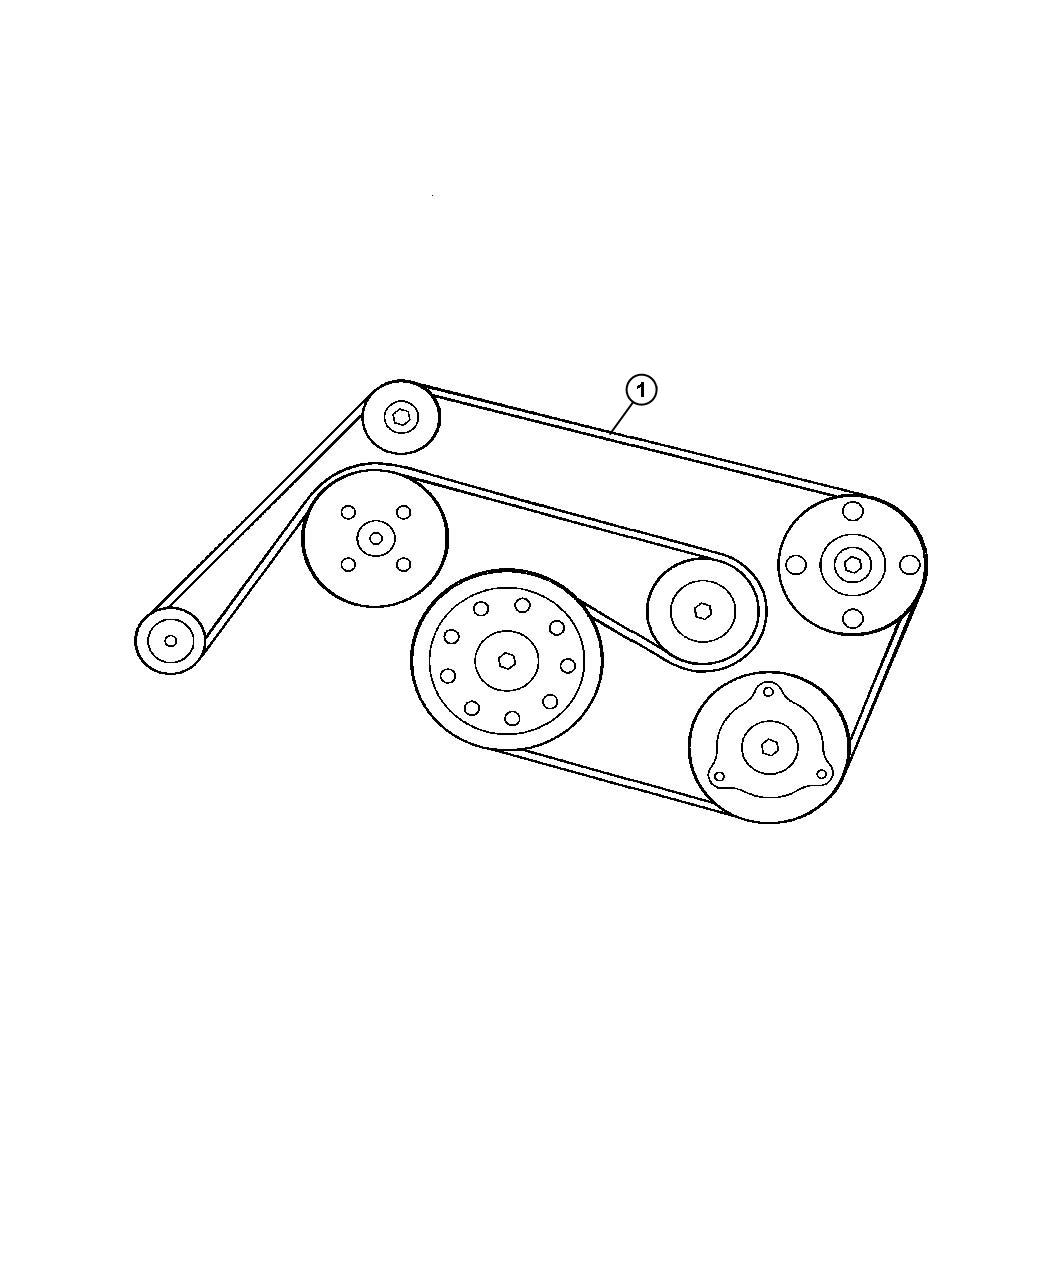 Chrysler Crossfire Belt. Accessory drive, serpentine